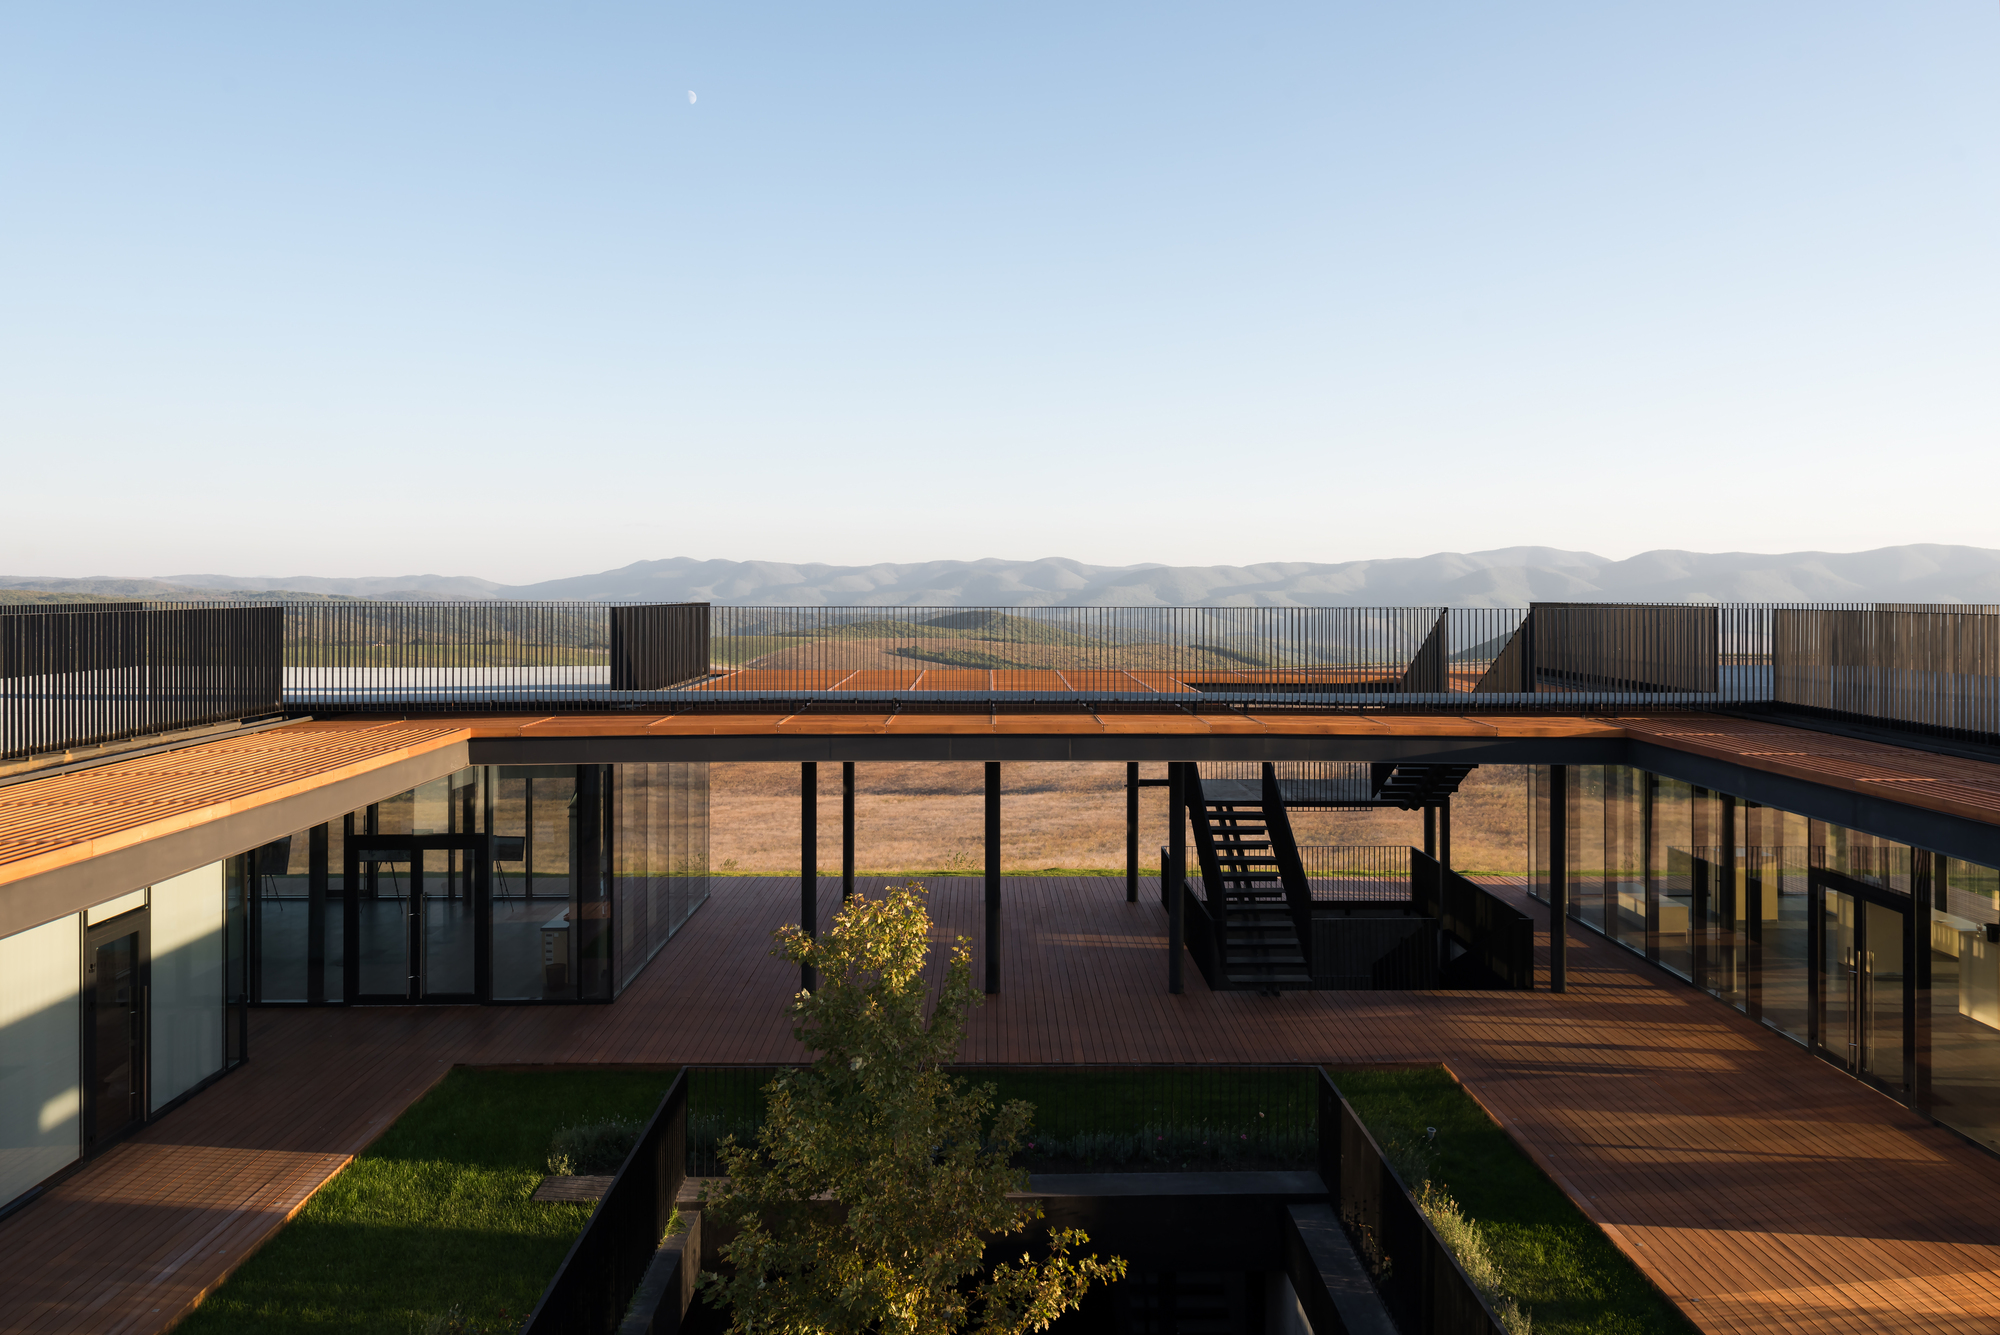 Bodega de vino gai kodzor kleinewelt architekten for Winery floor plans by architects